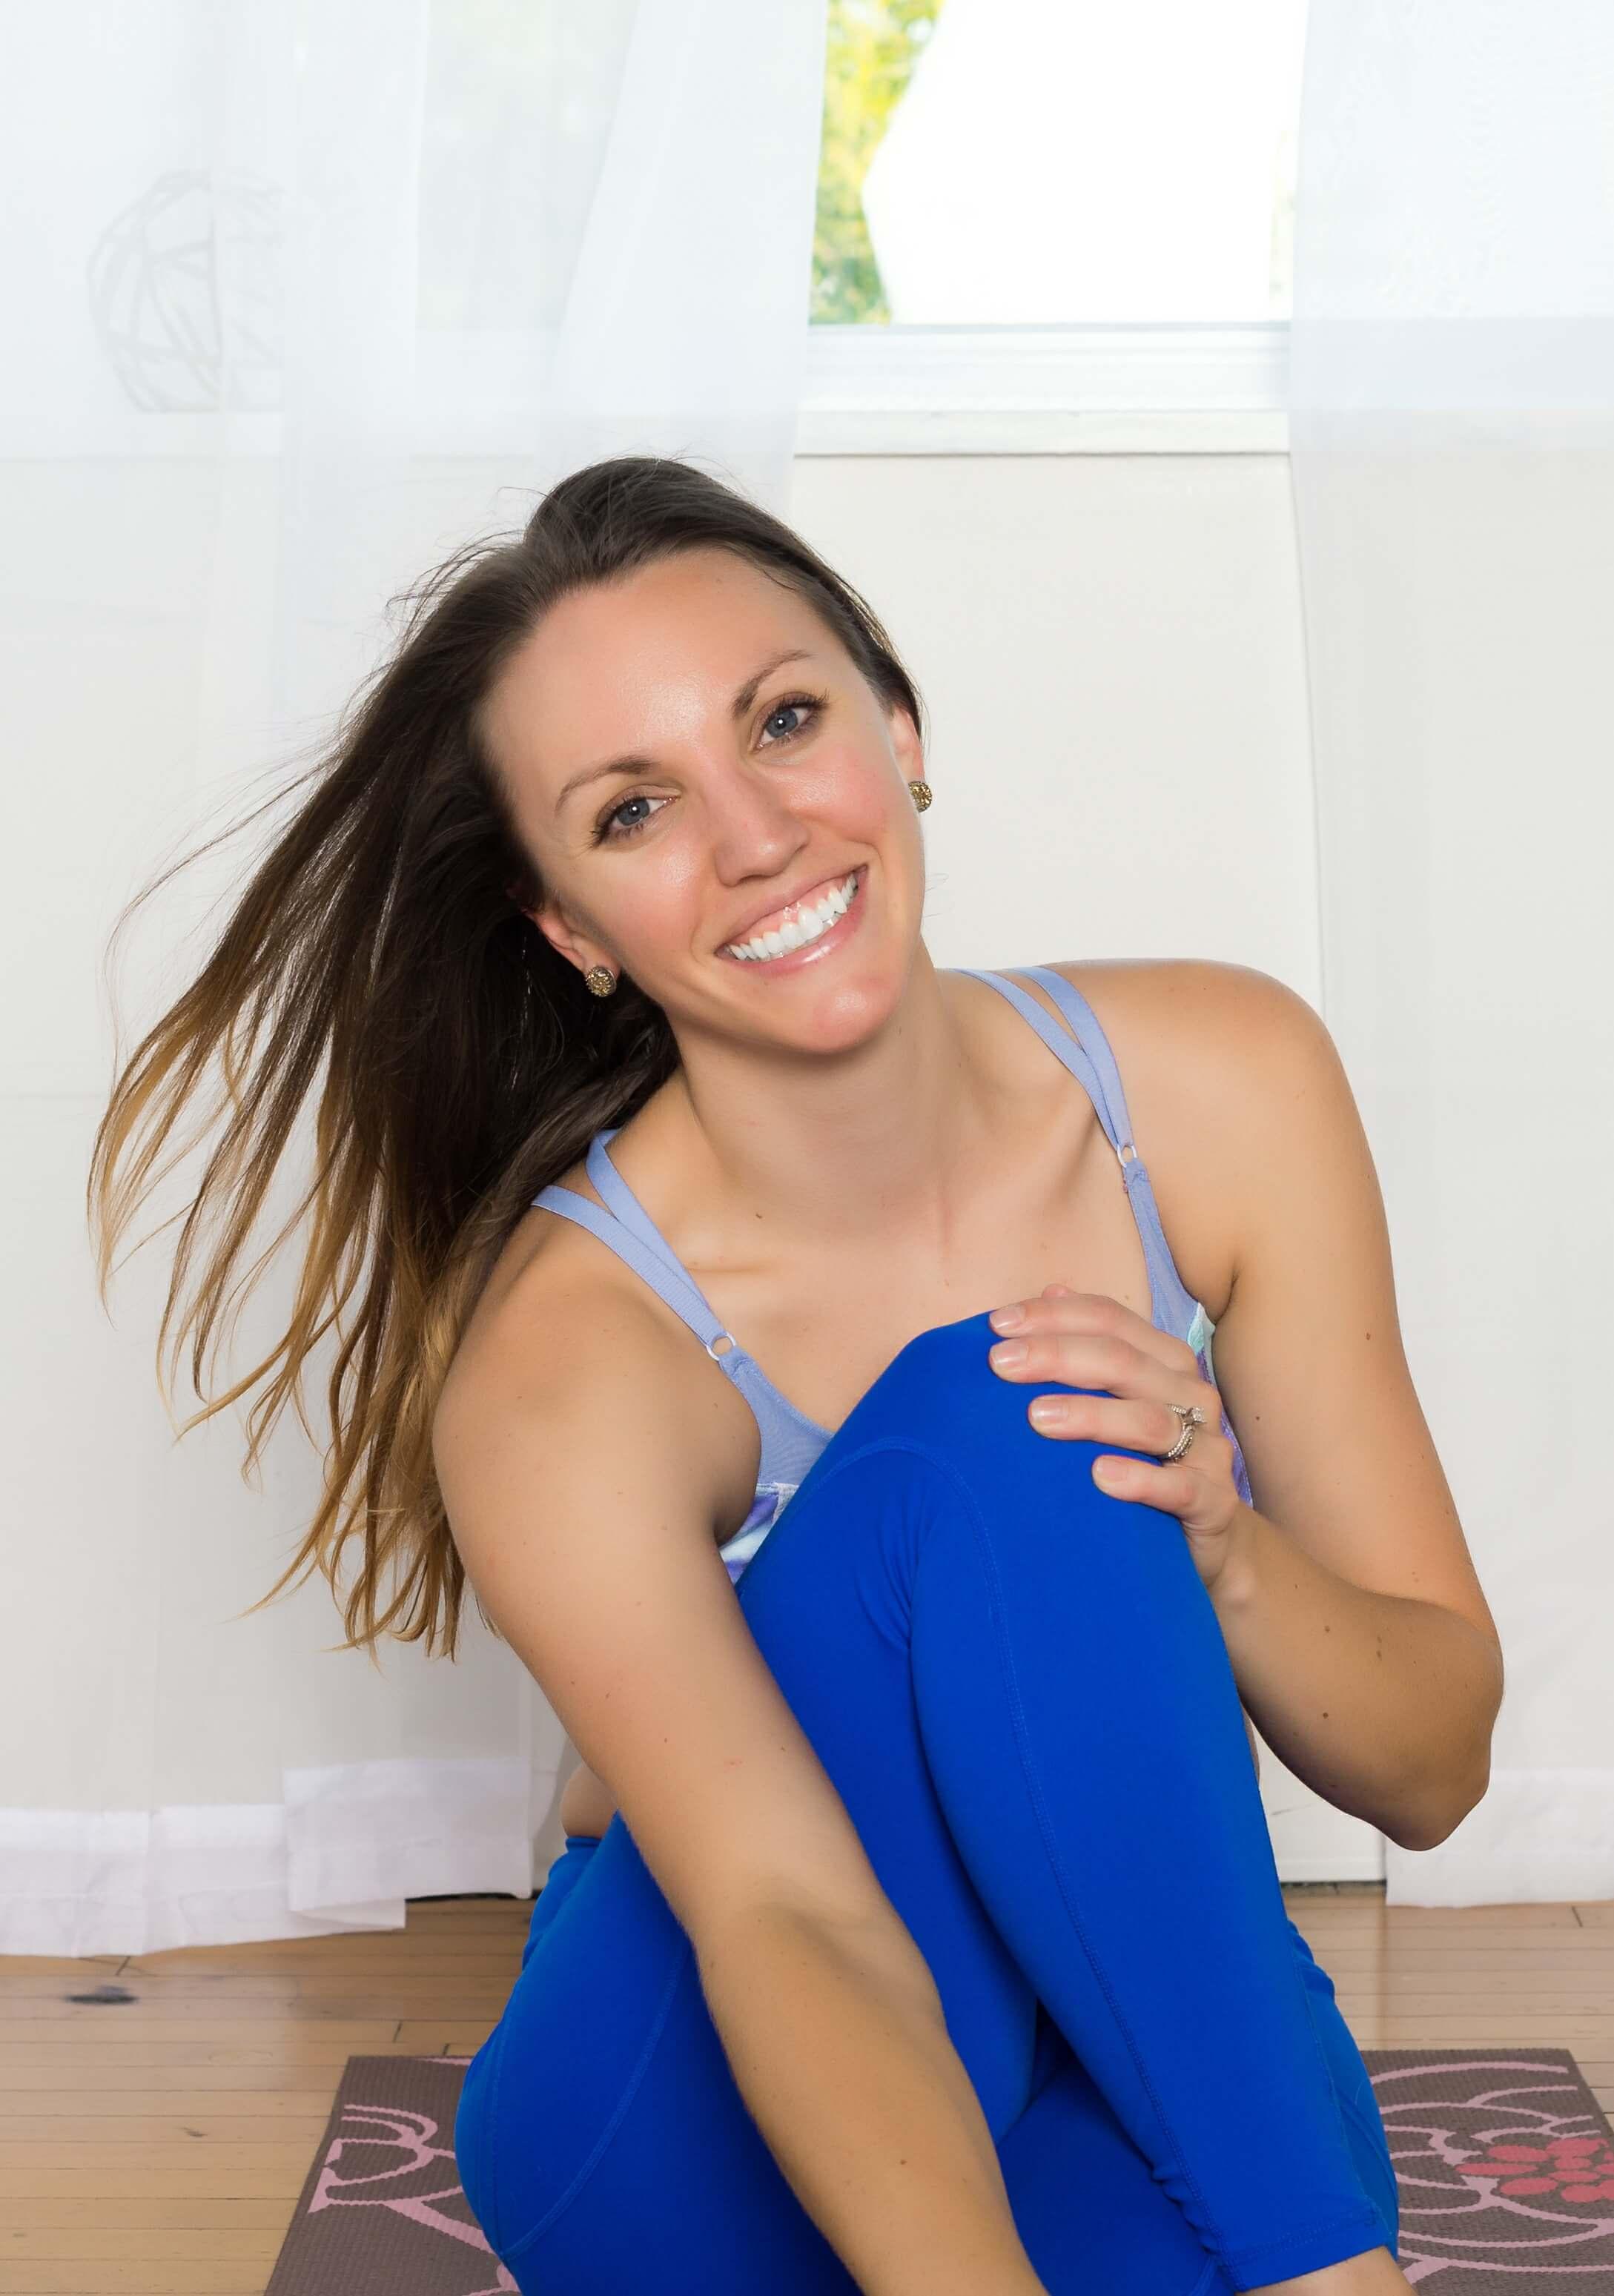 Chanel Nicole _ Louisville Photographer Tamera- fitness headshot.jpg